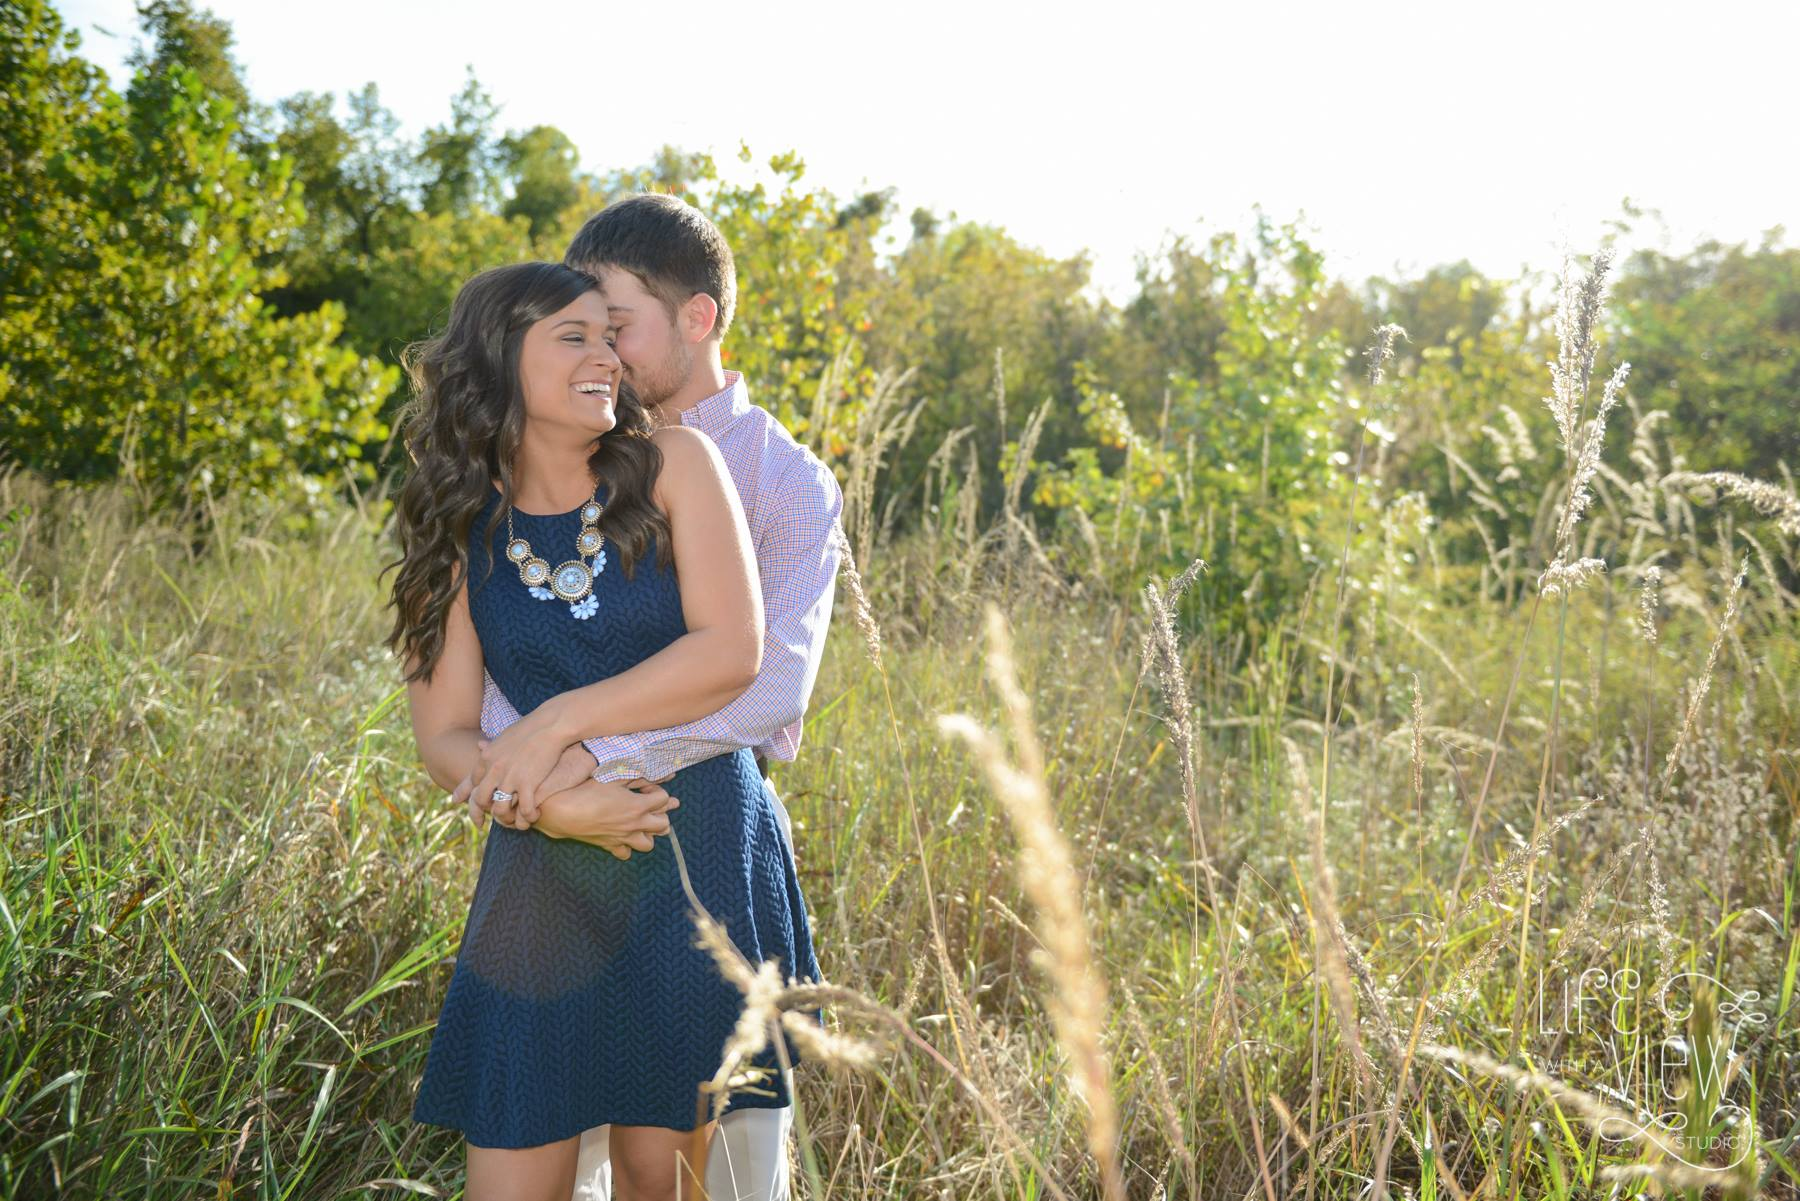 Chattanooga-Engagement 19.jpg